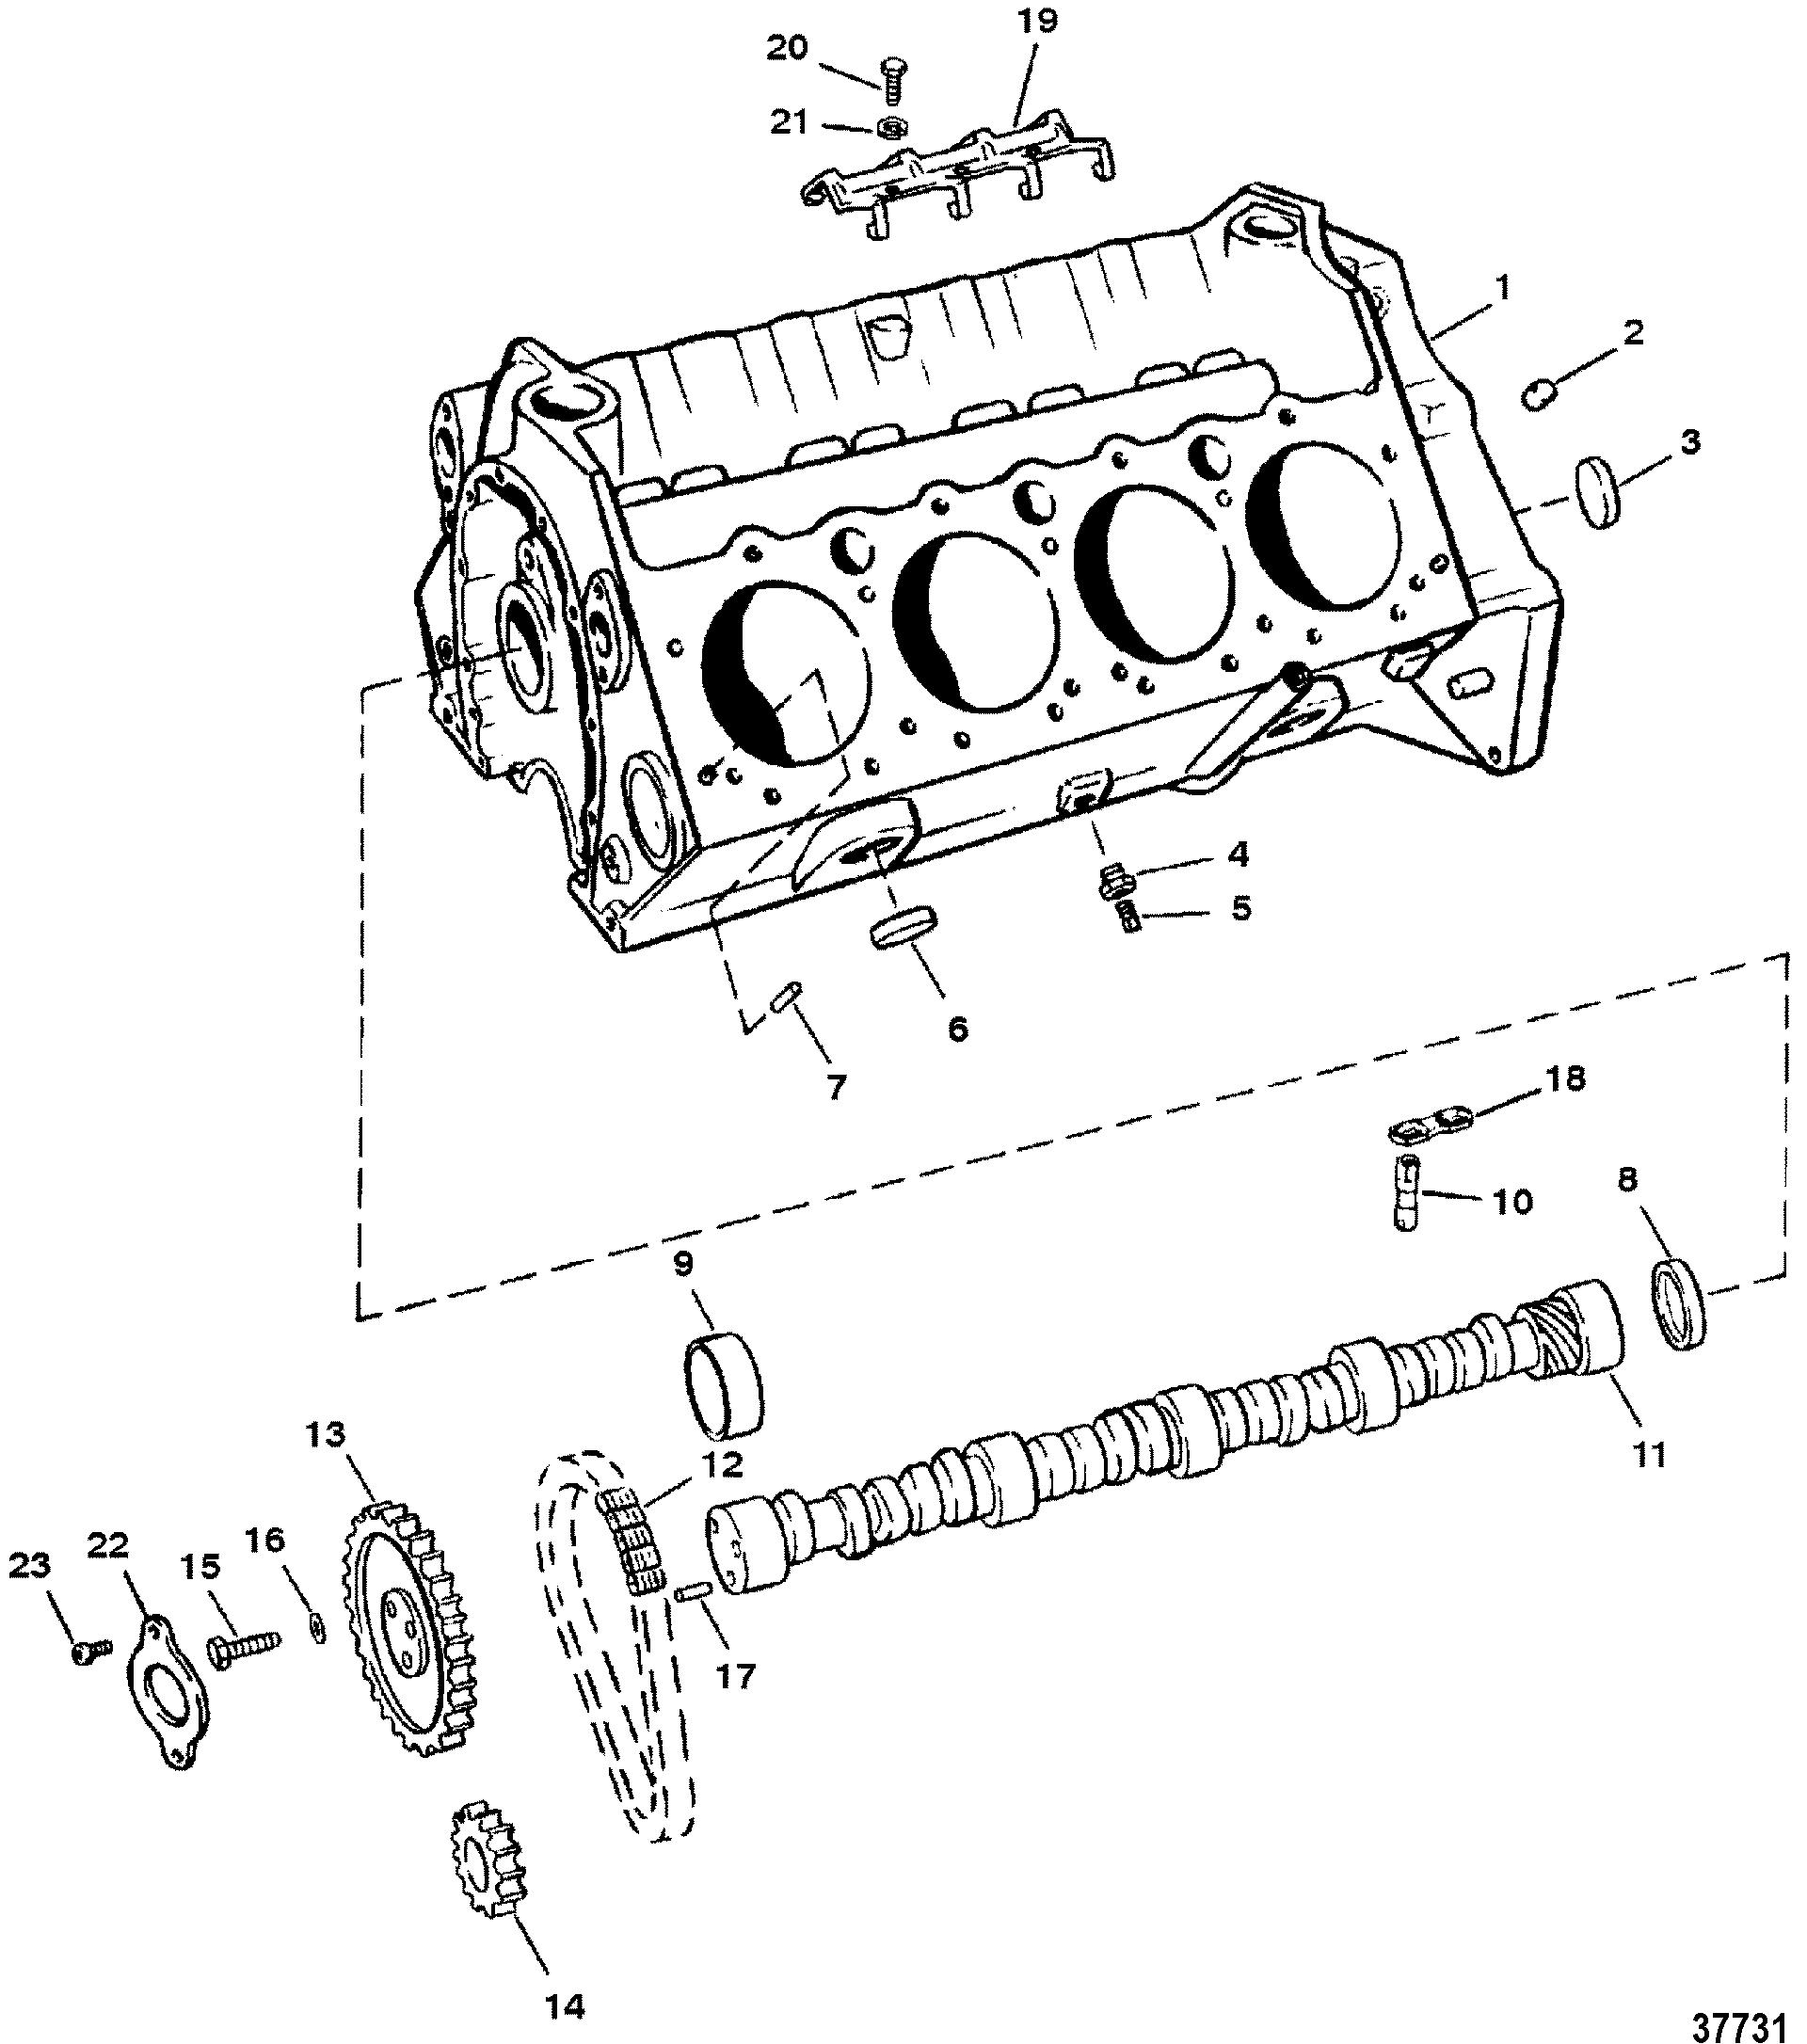 5.7L GM 350 V-8 1988-1995 - Serial 0B525982 Thru 0F600999 - Cylinder Block  And Camshaft (Roller Lifters)